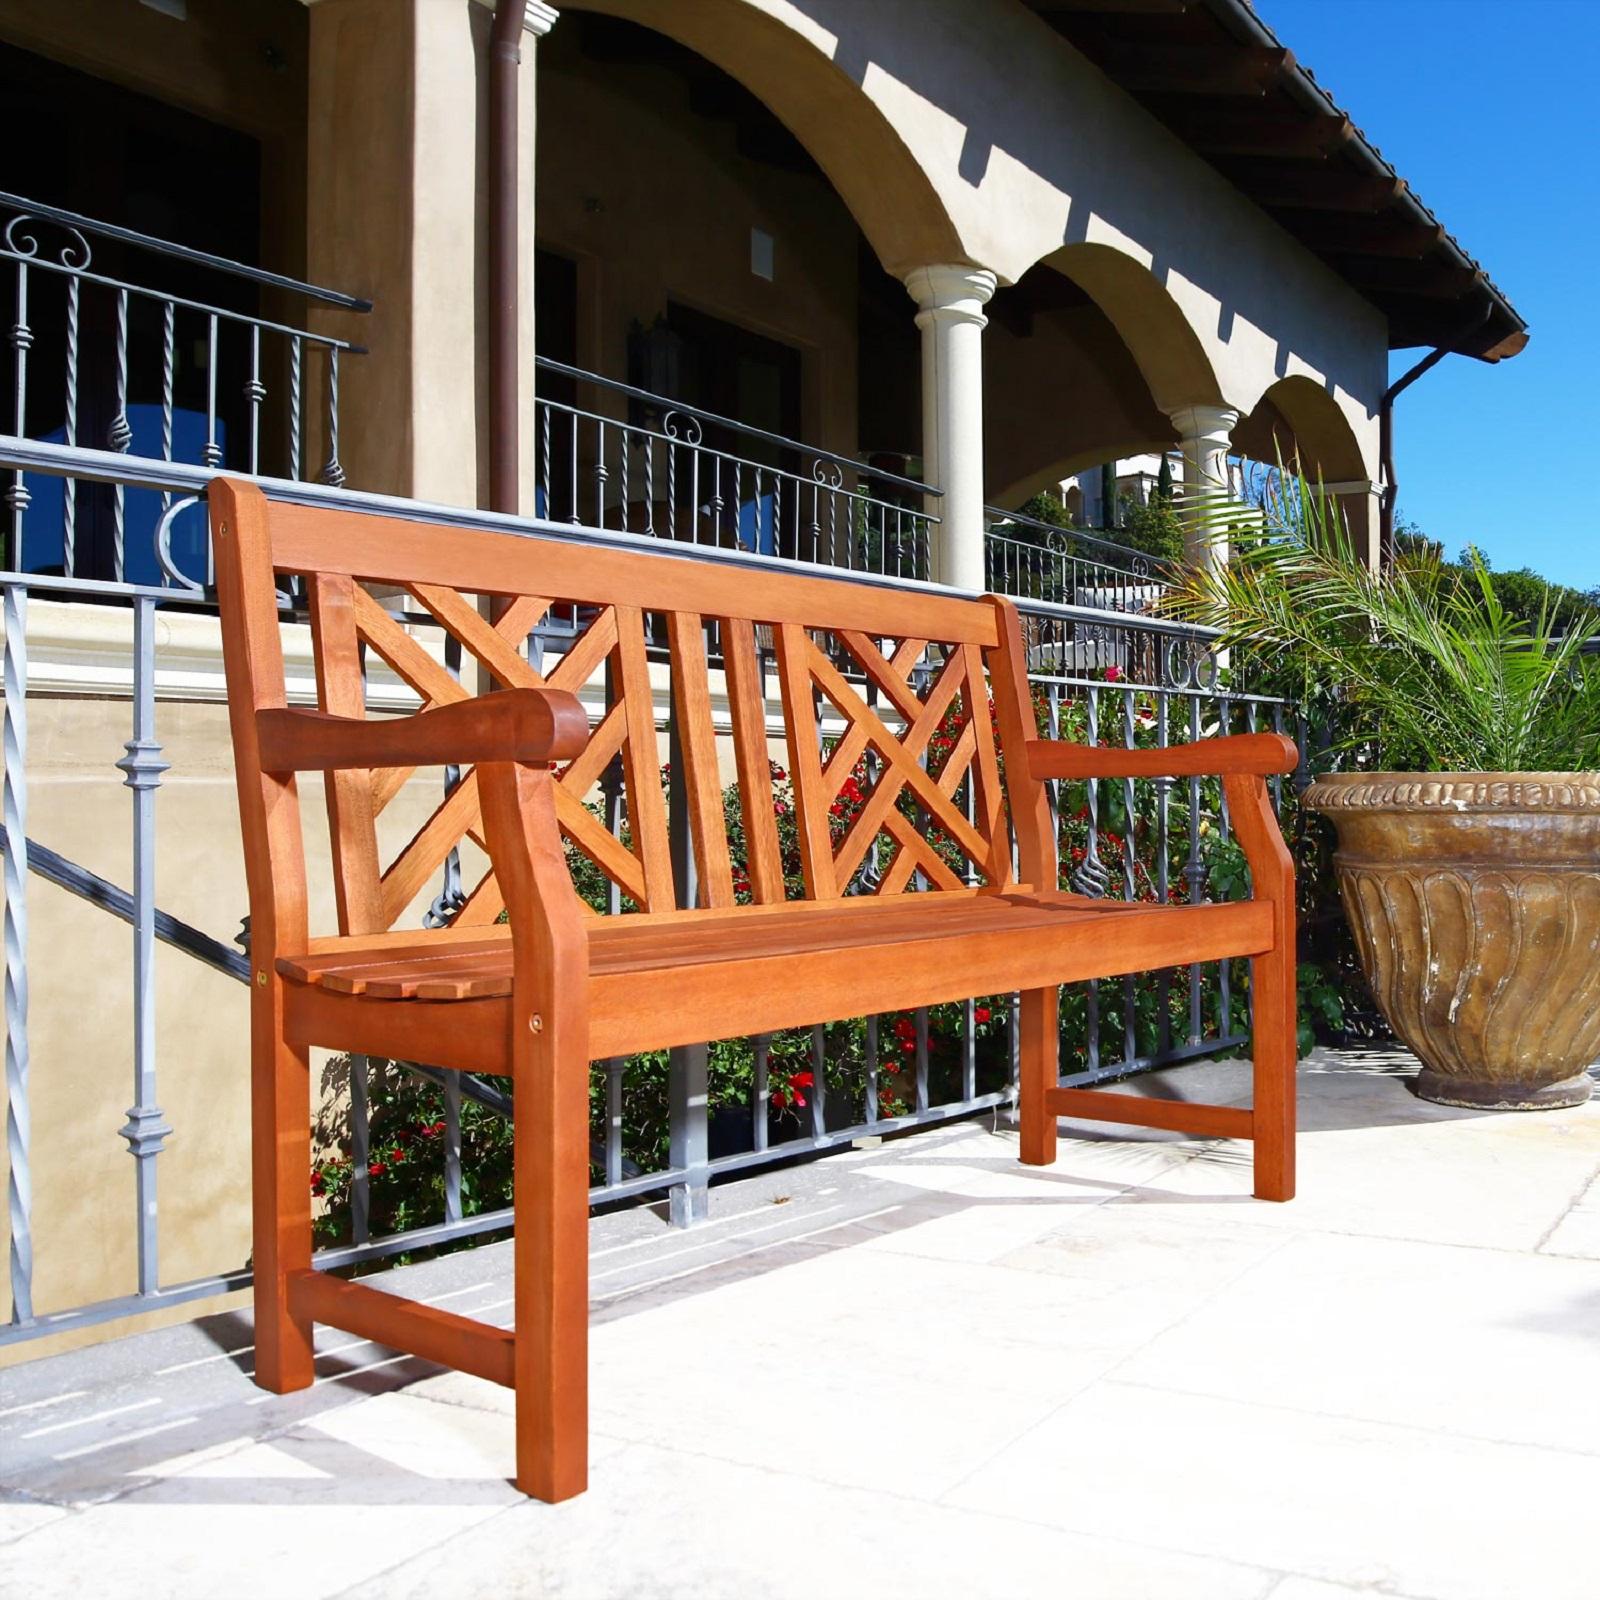 Malibu Outdoor Patio 4 Foot Wood Garden Bench – Walmart Throughout Maliyah Wooden Garden Benches (View 12 of 25)